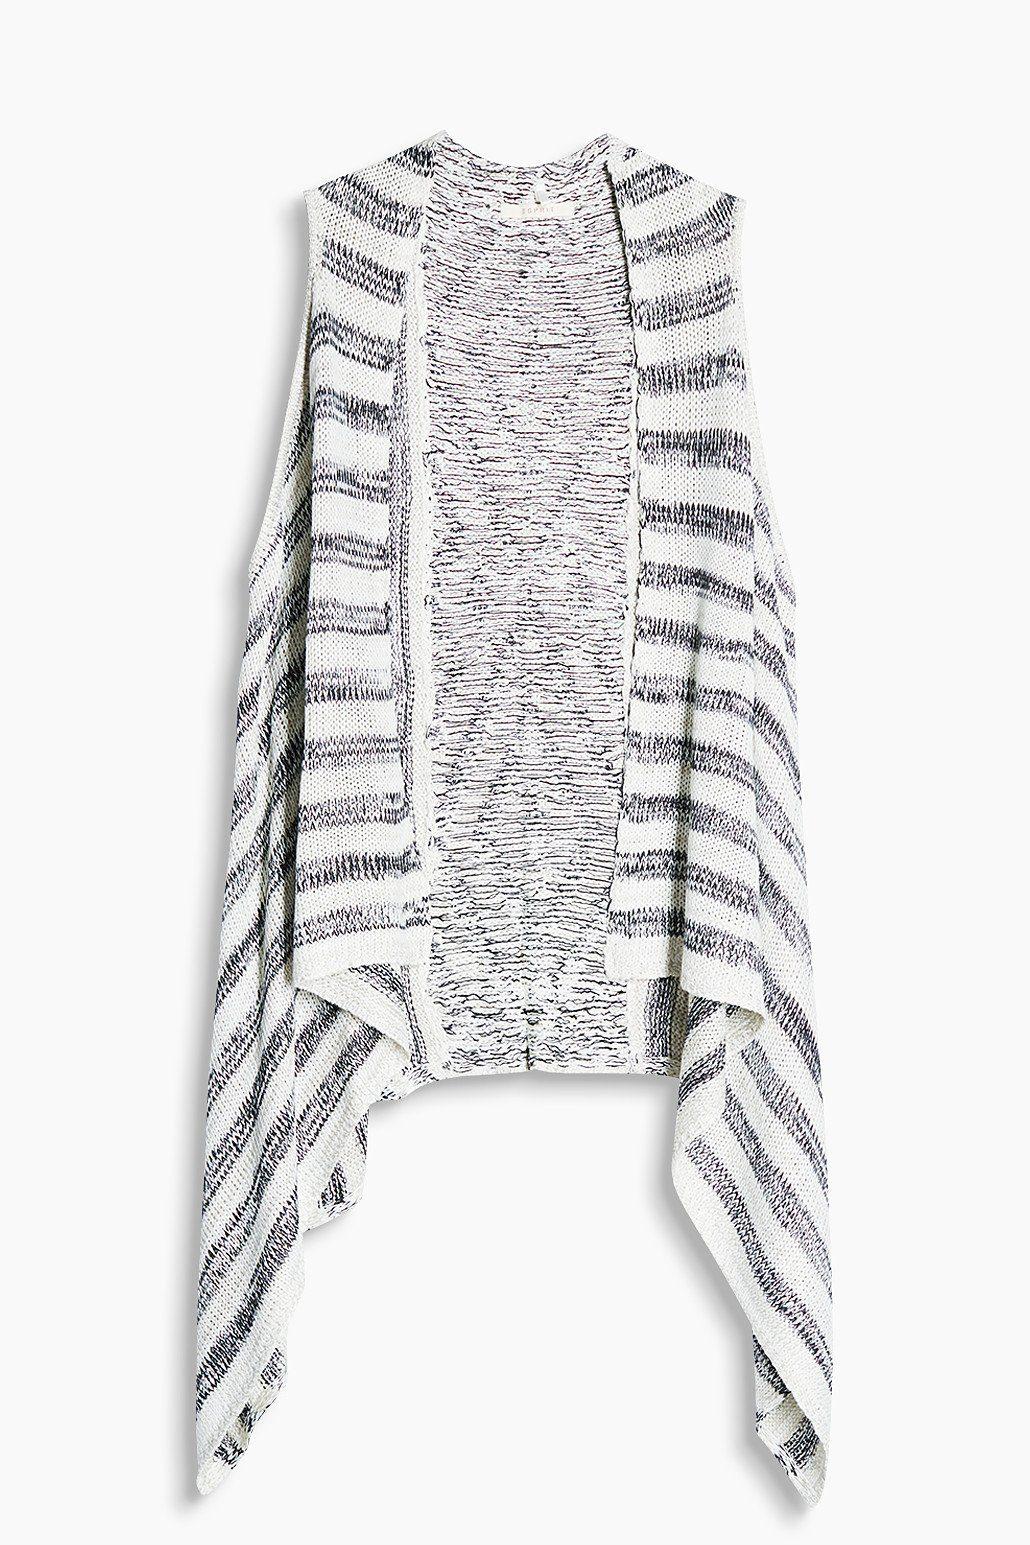 ESPRIT CASUAL Lässige Strickweste mit Ikat-Muster